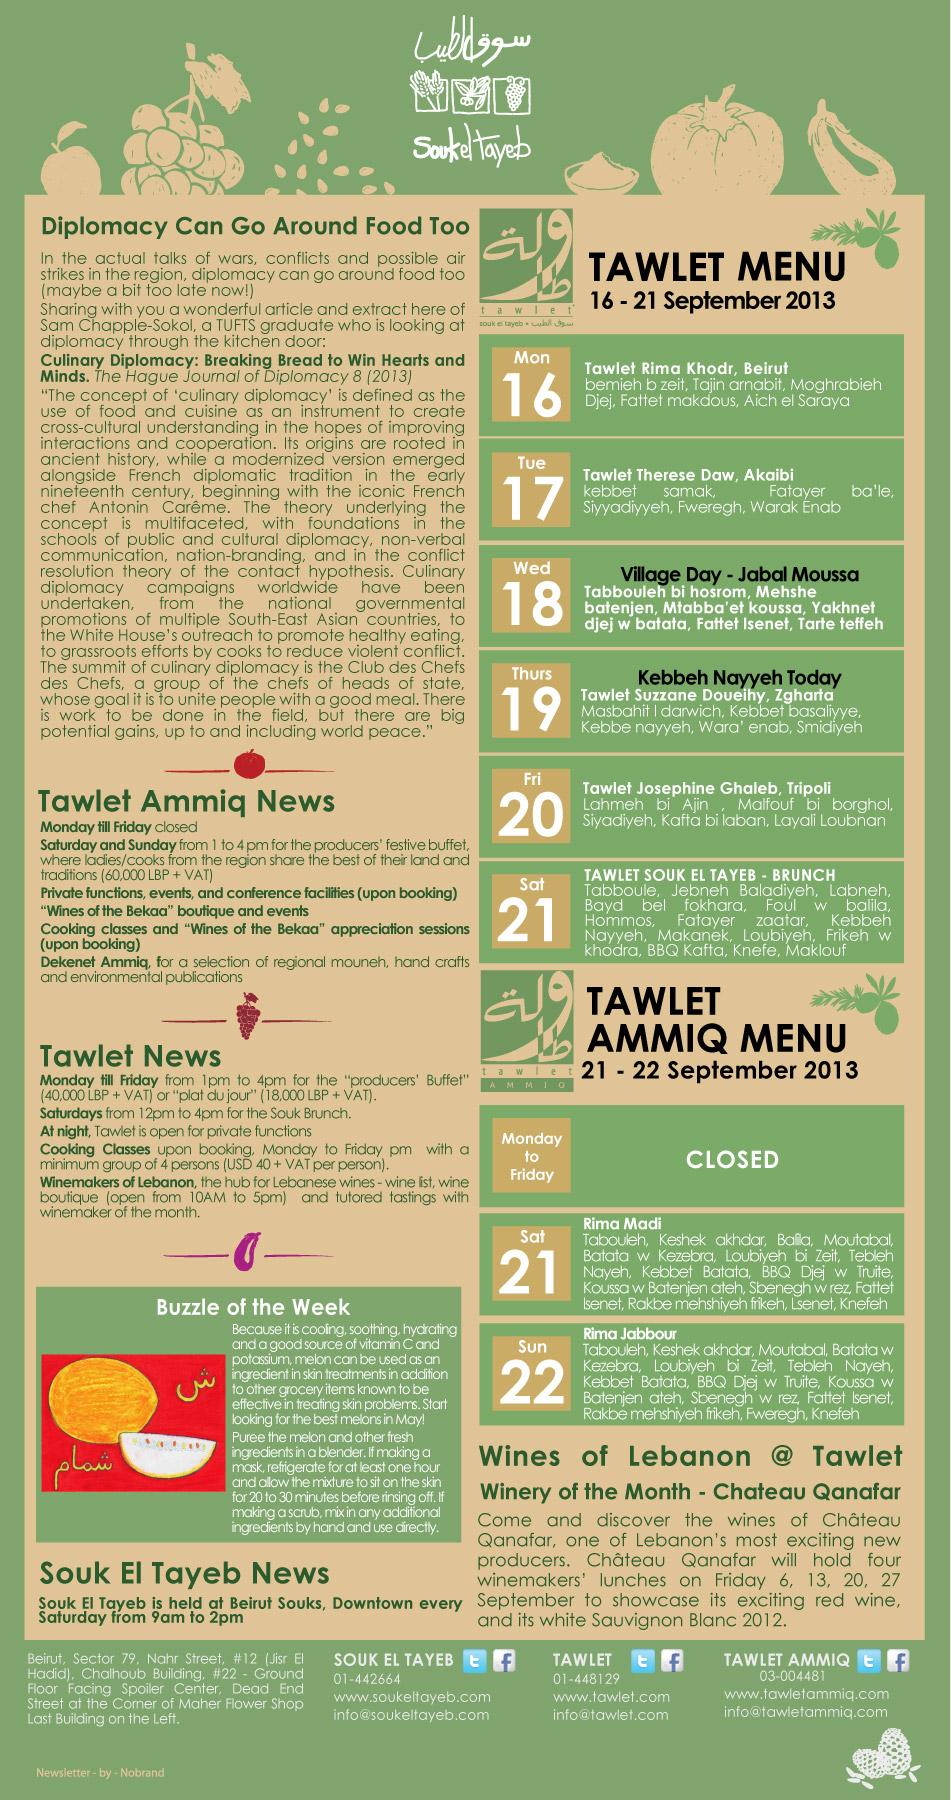 Souk el Tayeb Newsletter